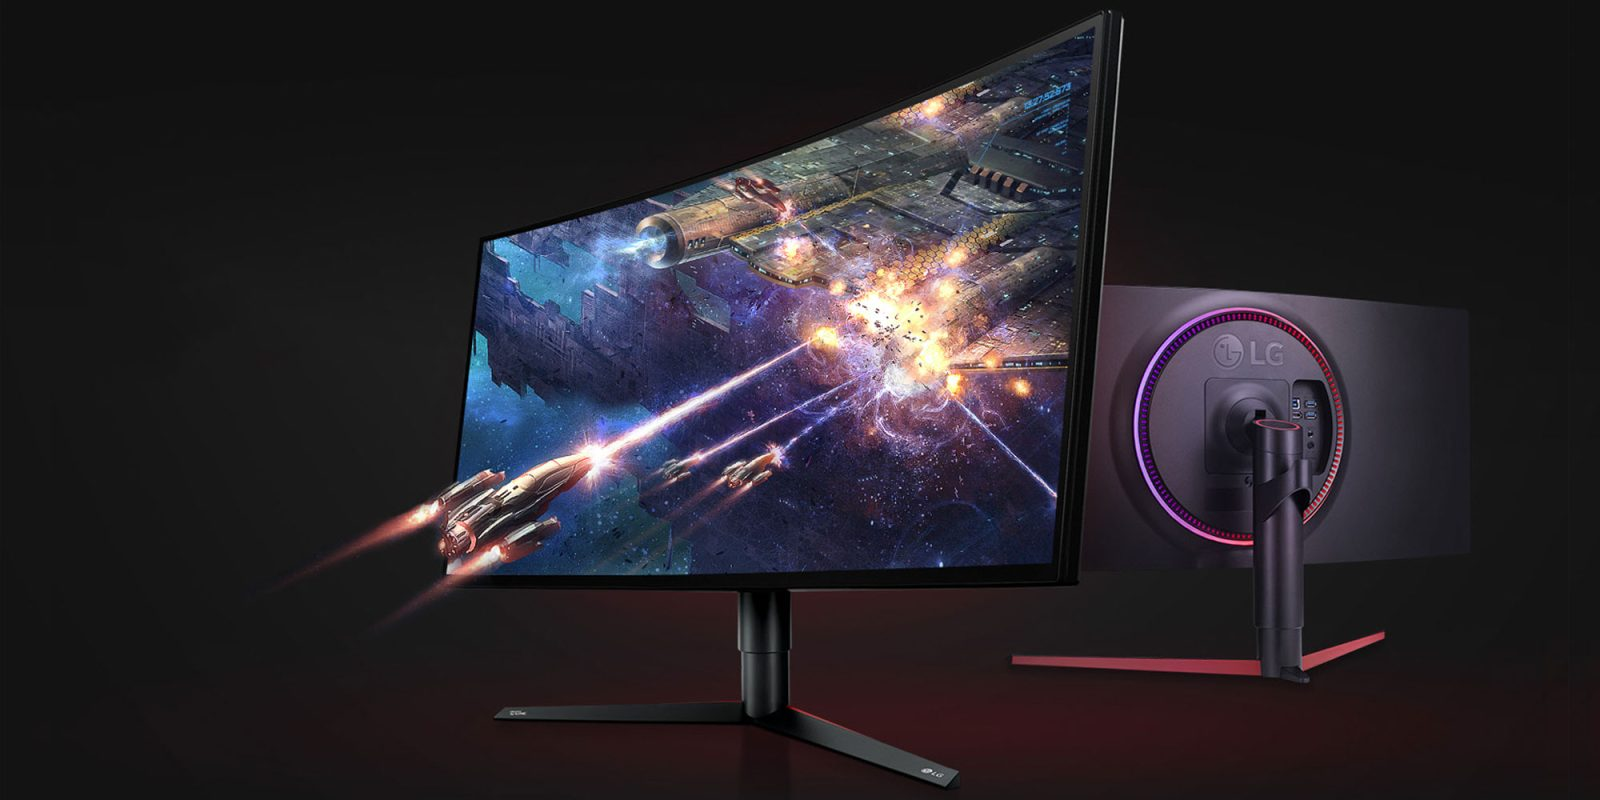 LG's new 21:9 gaming monitor packs 120Hz G-SYNC, Viotek